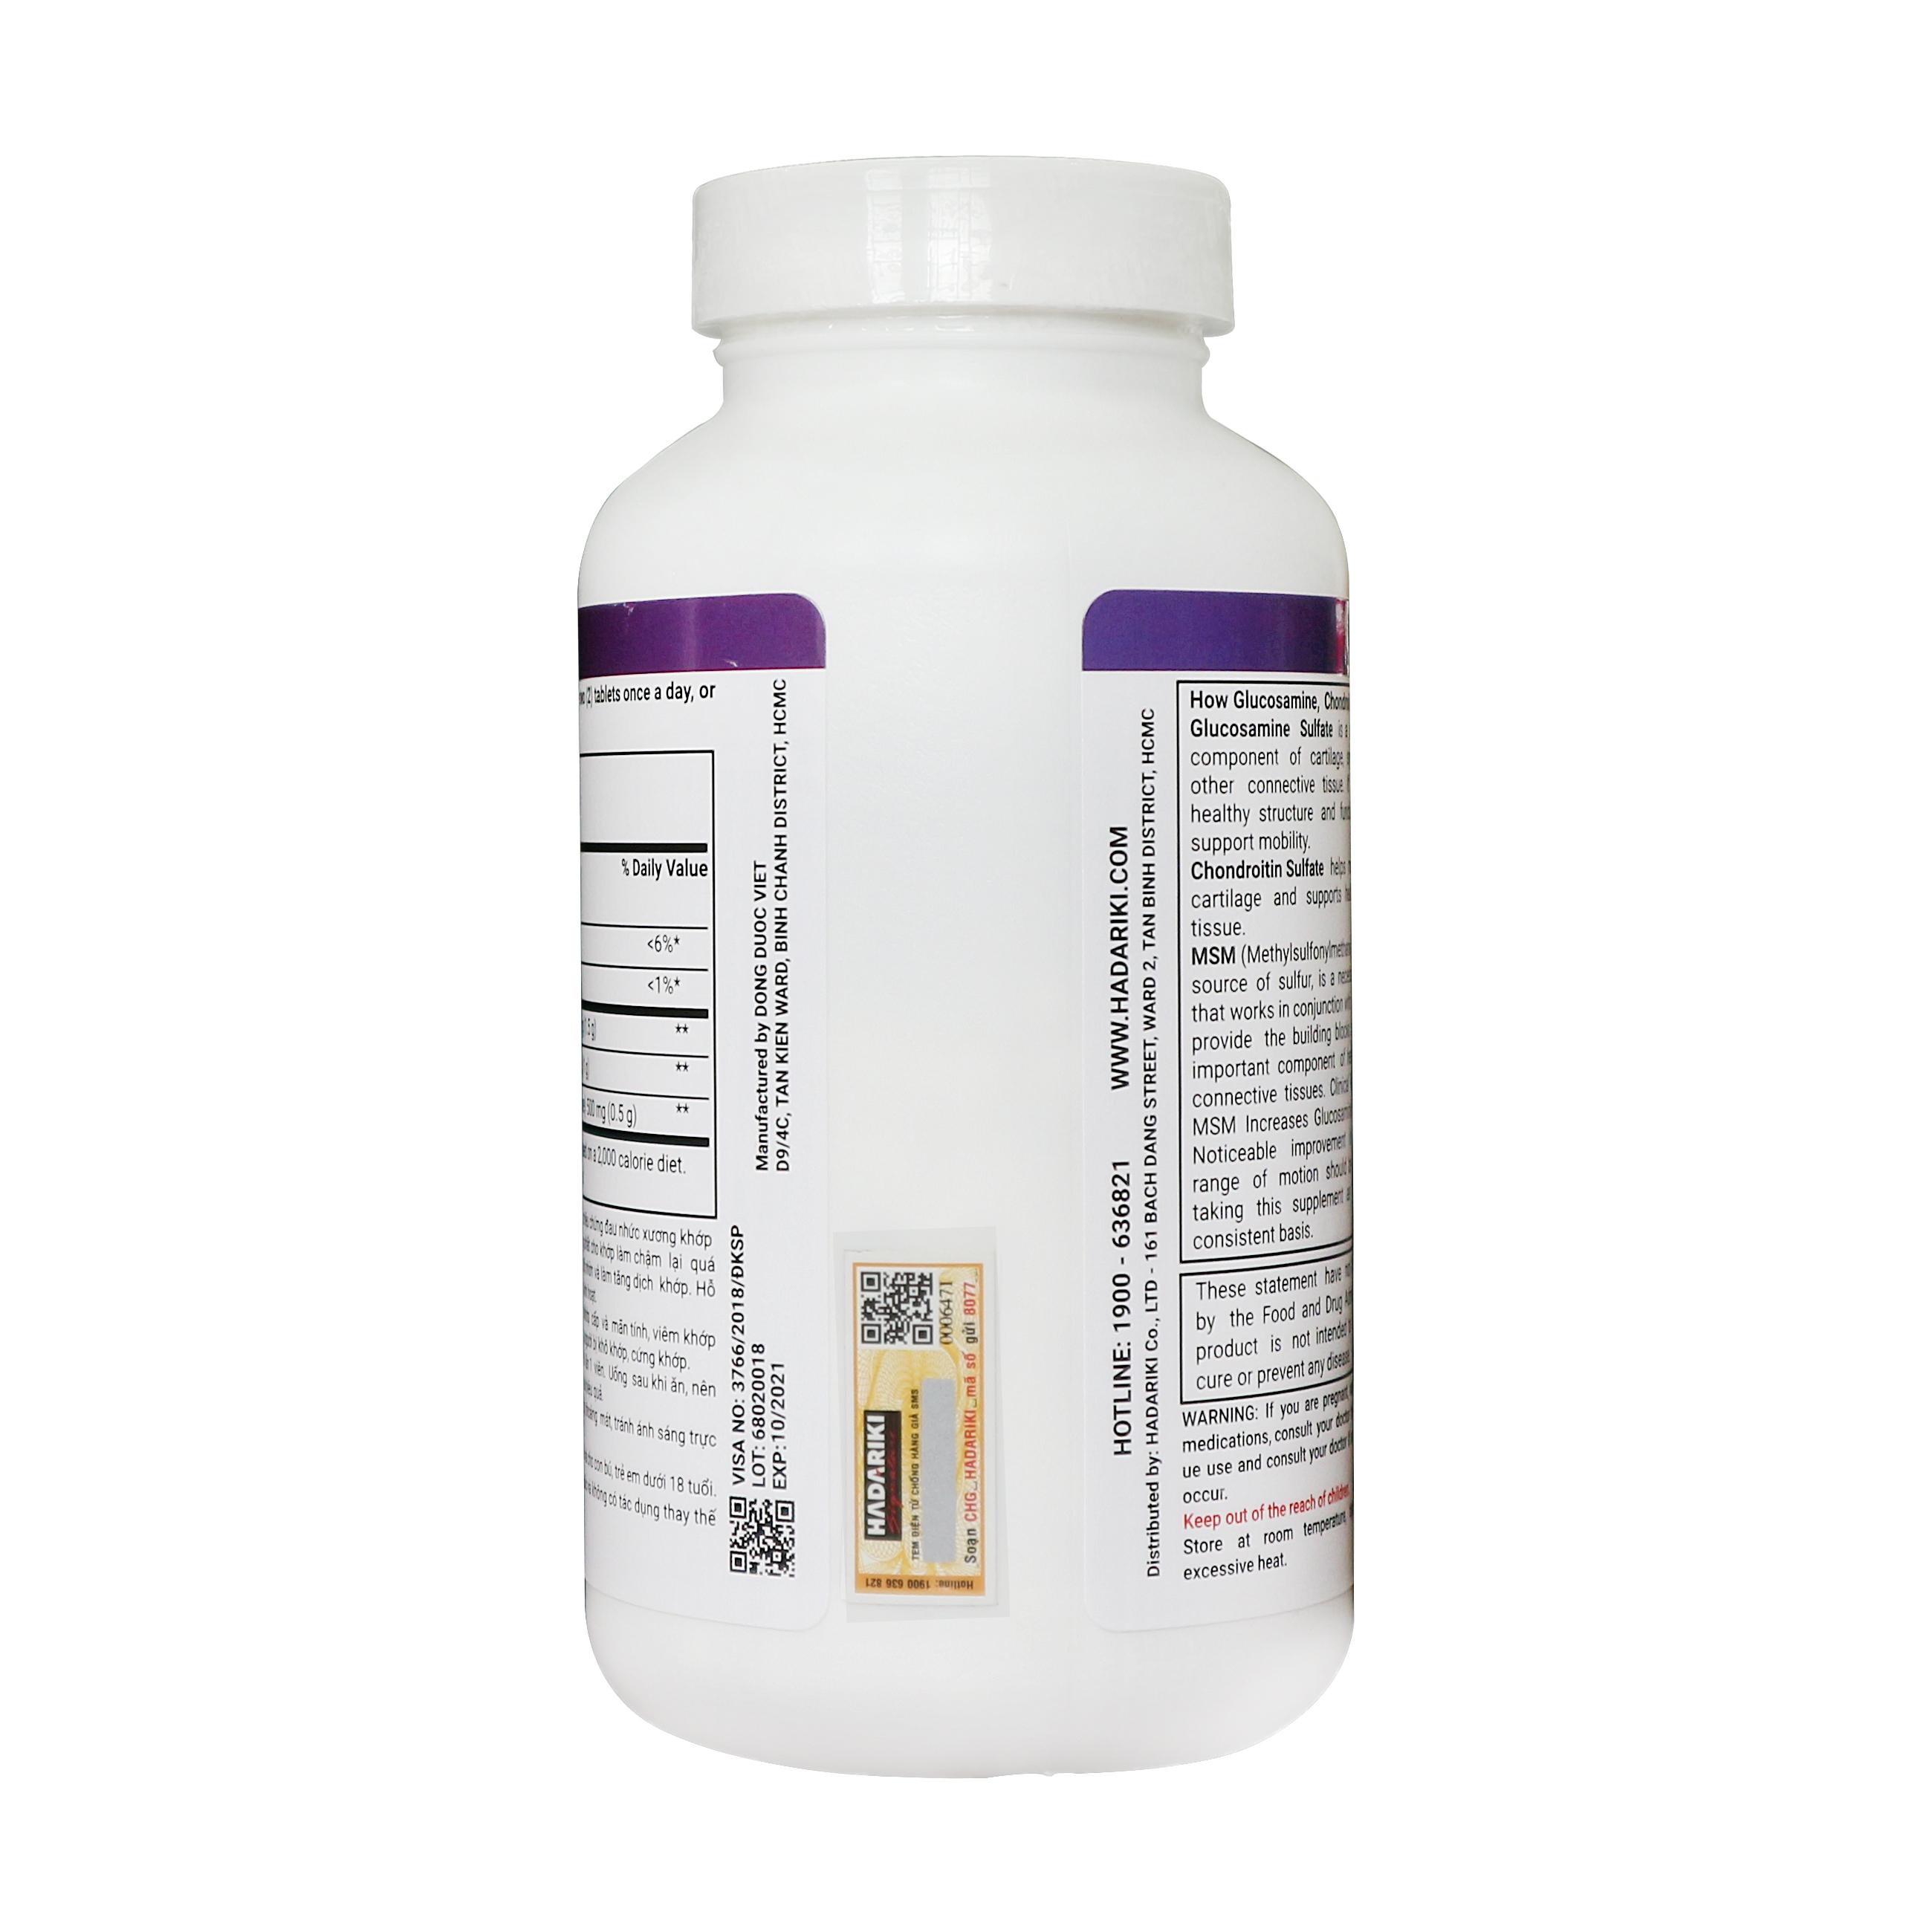 Hadariki Glucosamine 1500mg, Chondroitin 1000mg, MSM 500mg bổ khớp (New)